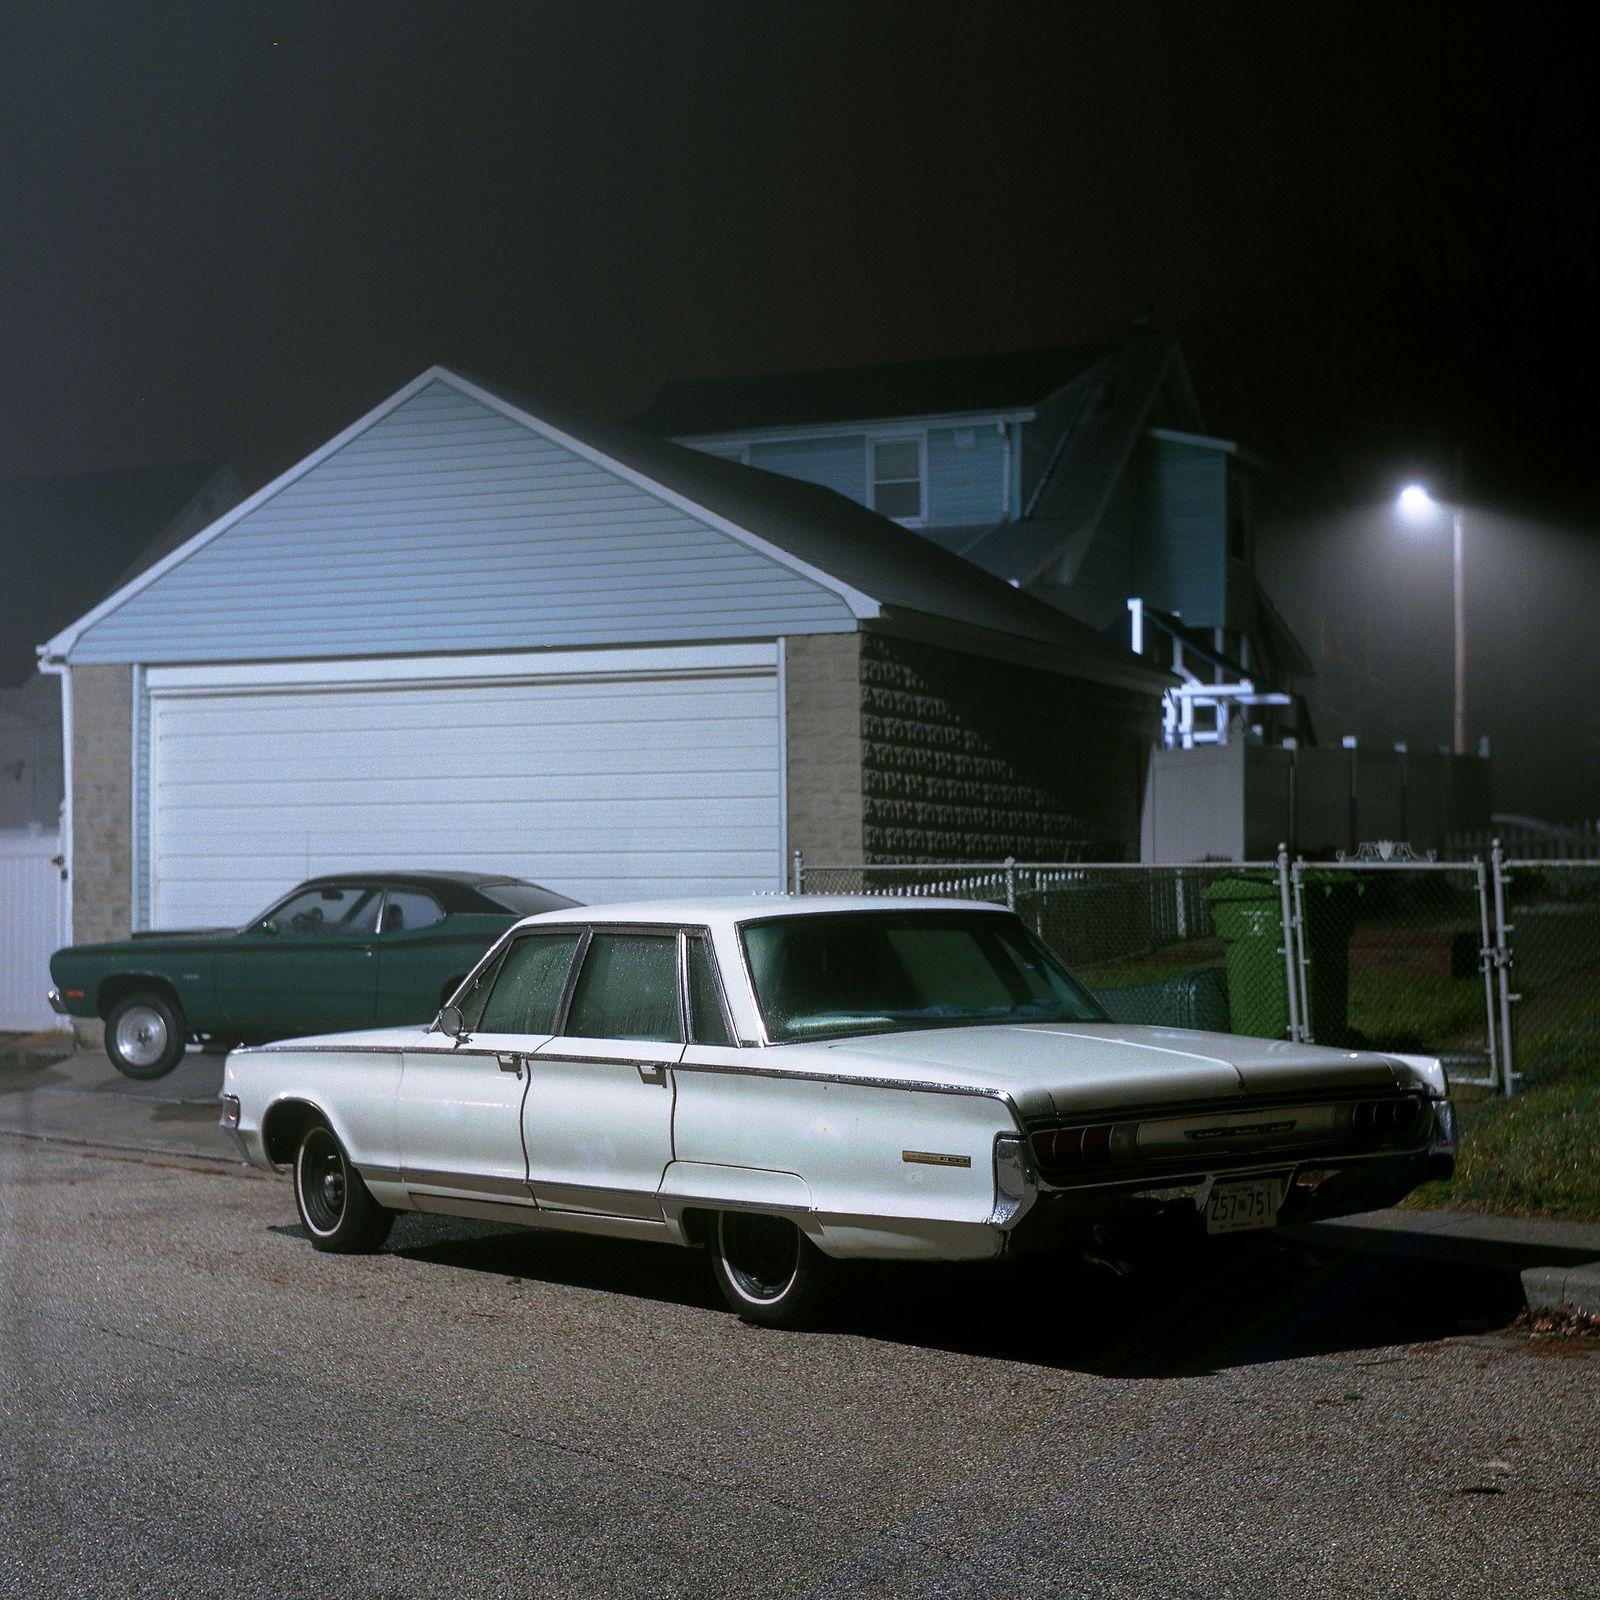 https://flic.kr/p/ZeE3NC | Untitled | patrickjoust | flickr | tumblr | instagram | facebook | books | prints  ...  Rolleiflex Automat MX-EVS  Kodak Portra 160